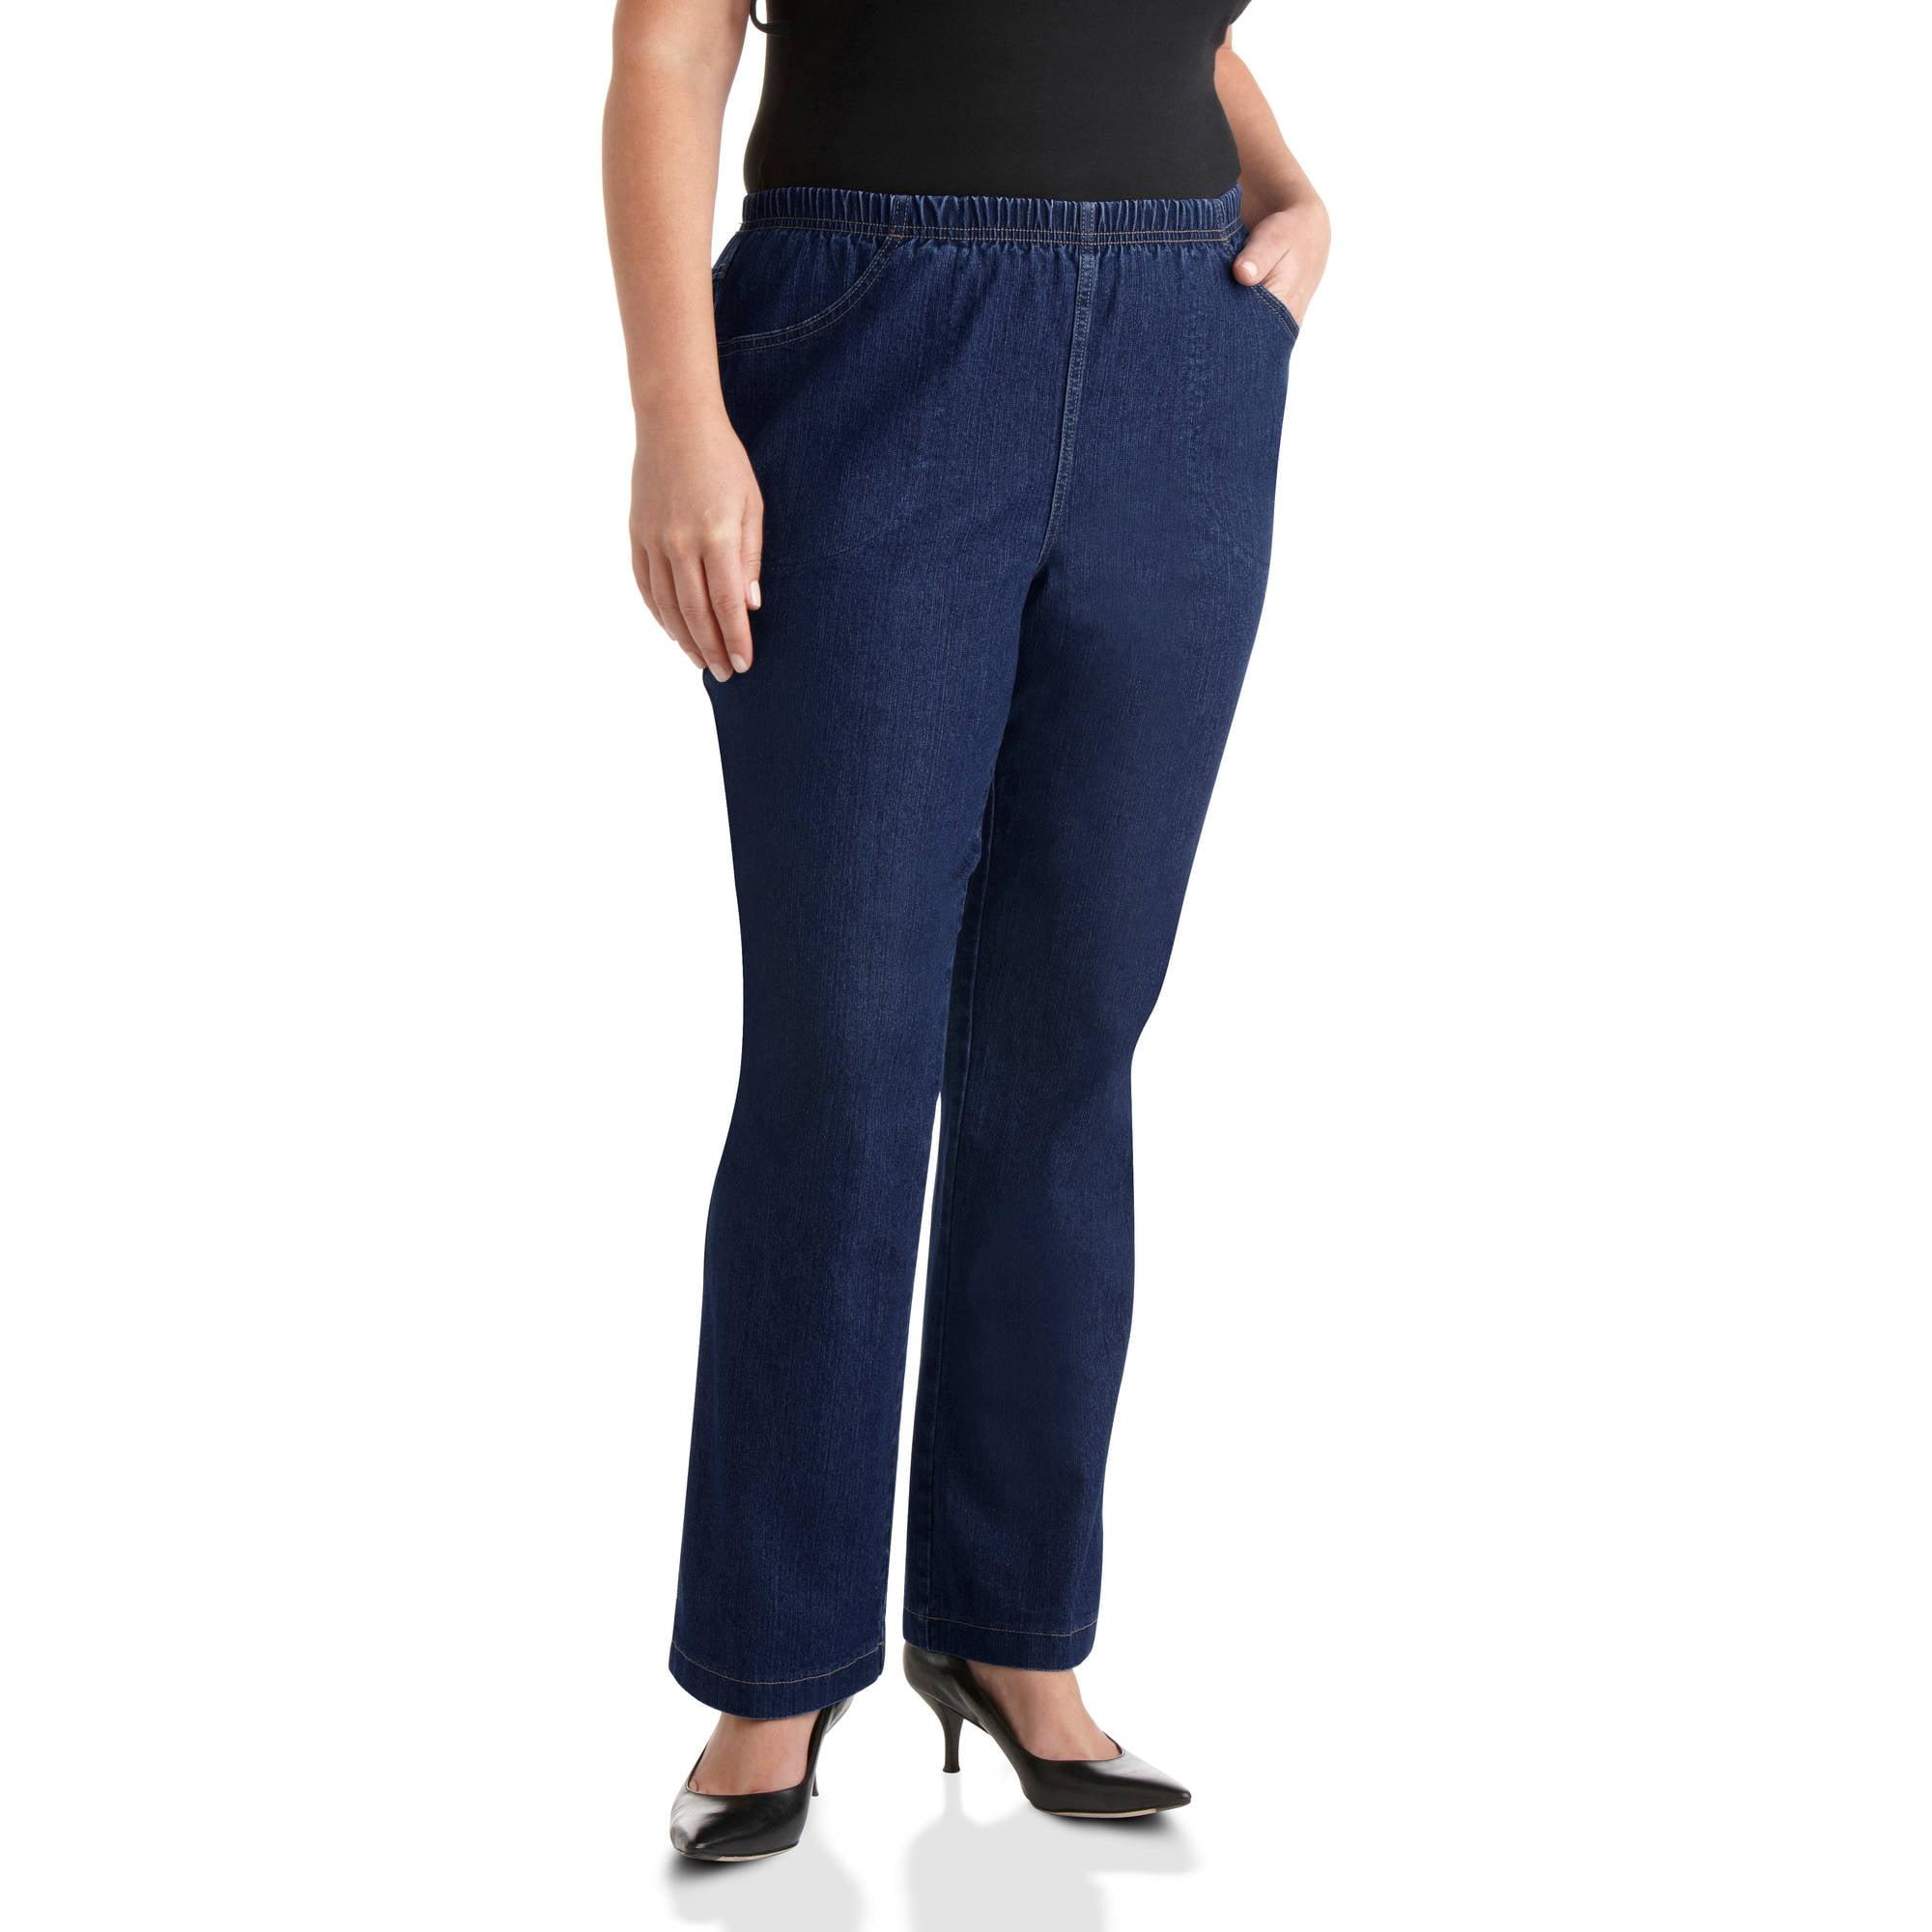 Just My Size Womens Plus Shorts Capris